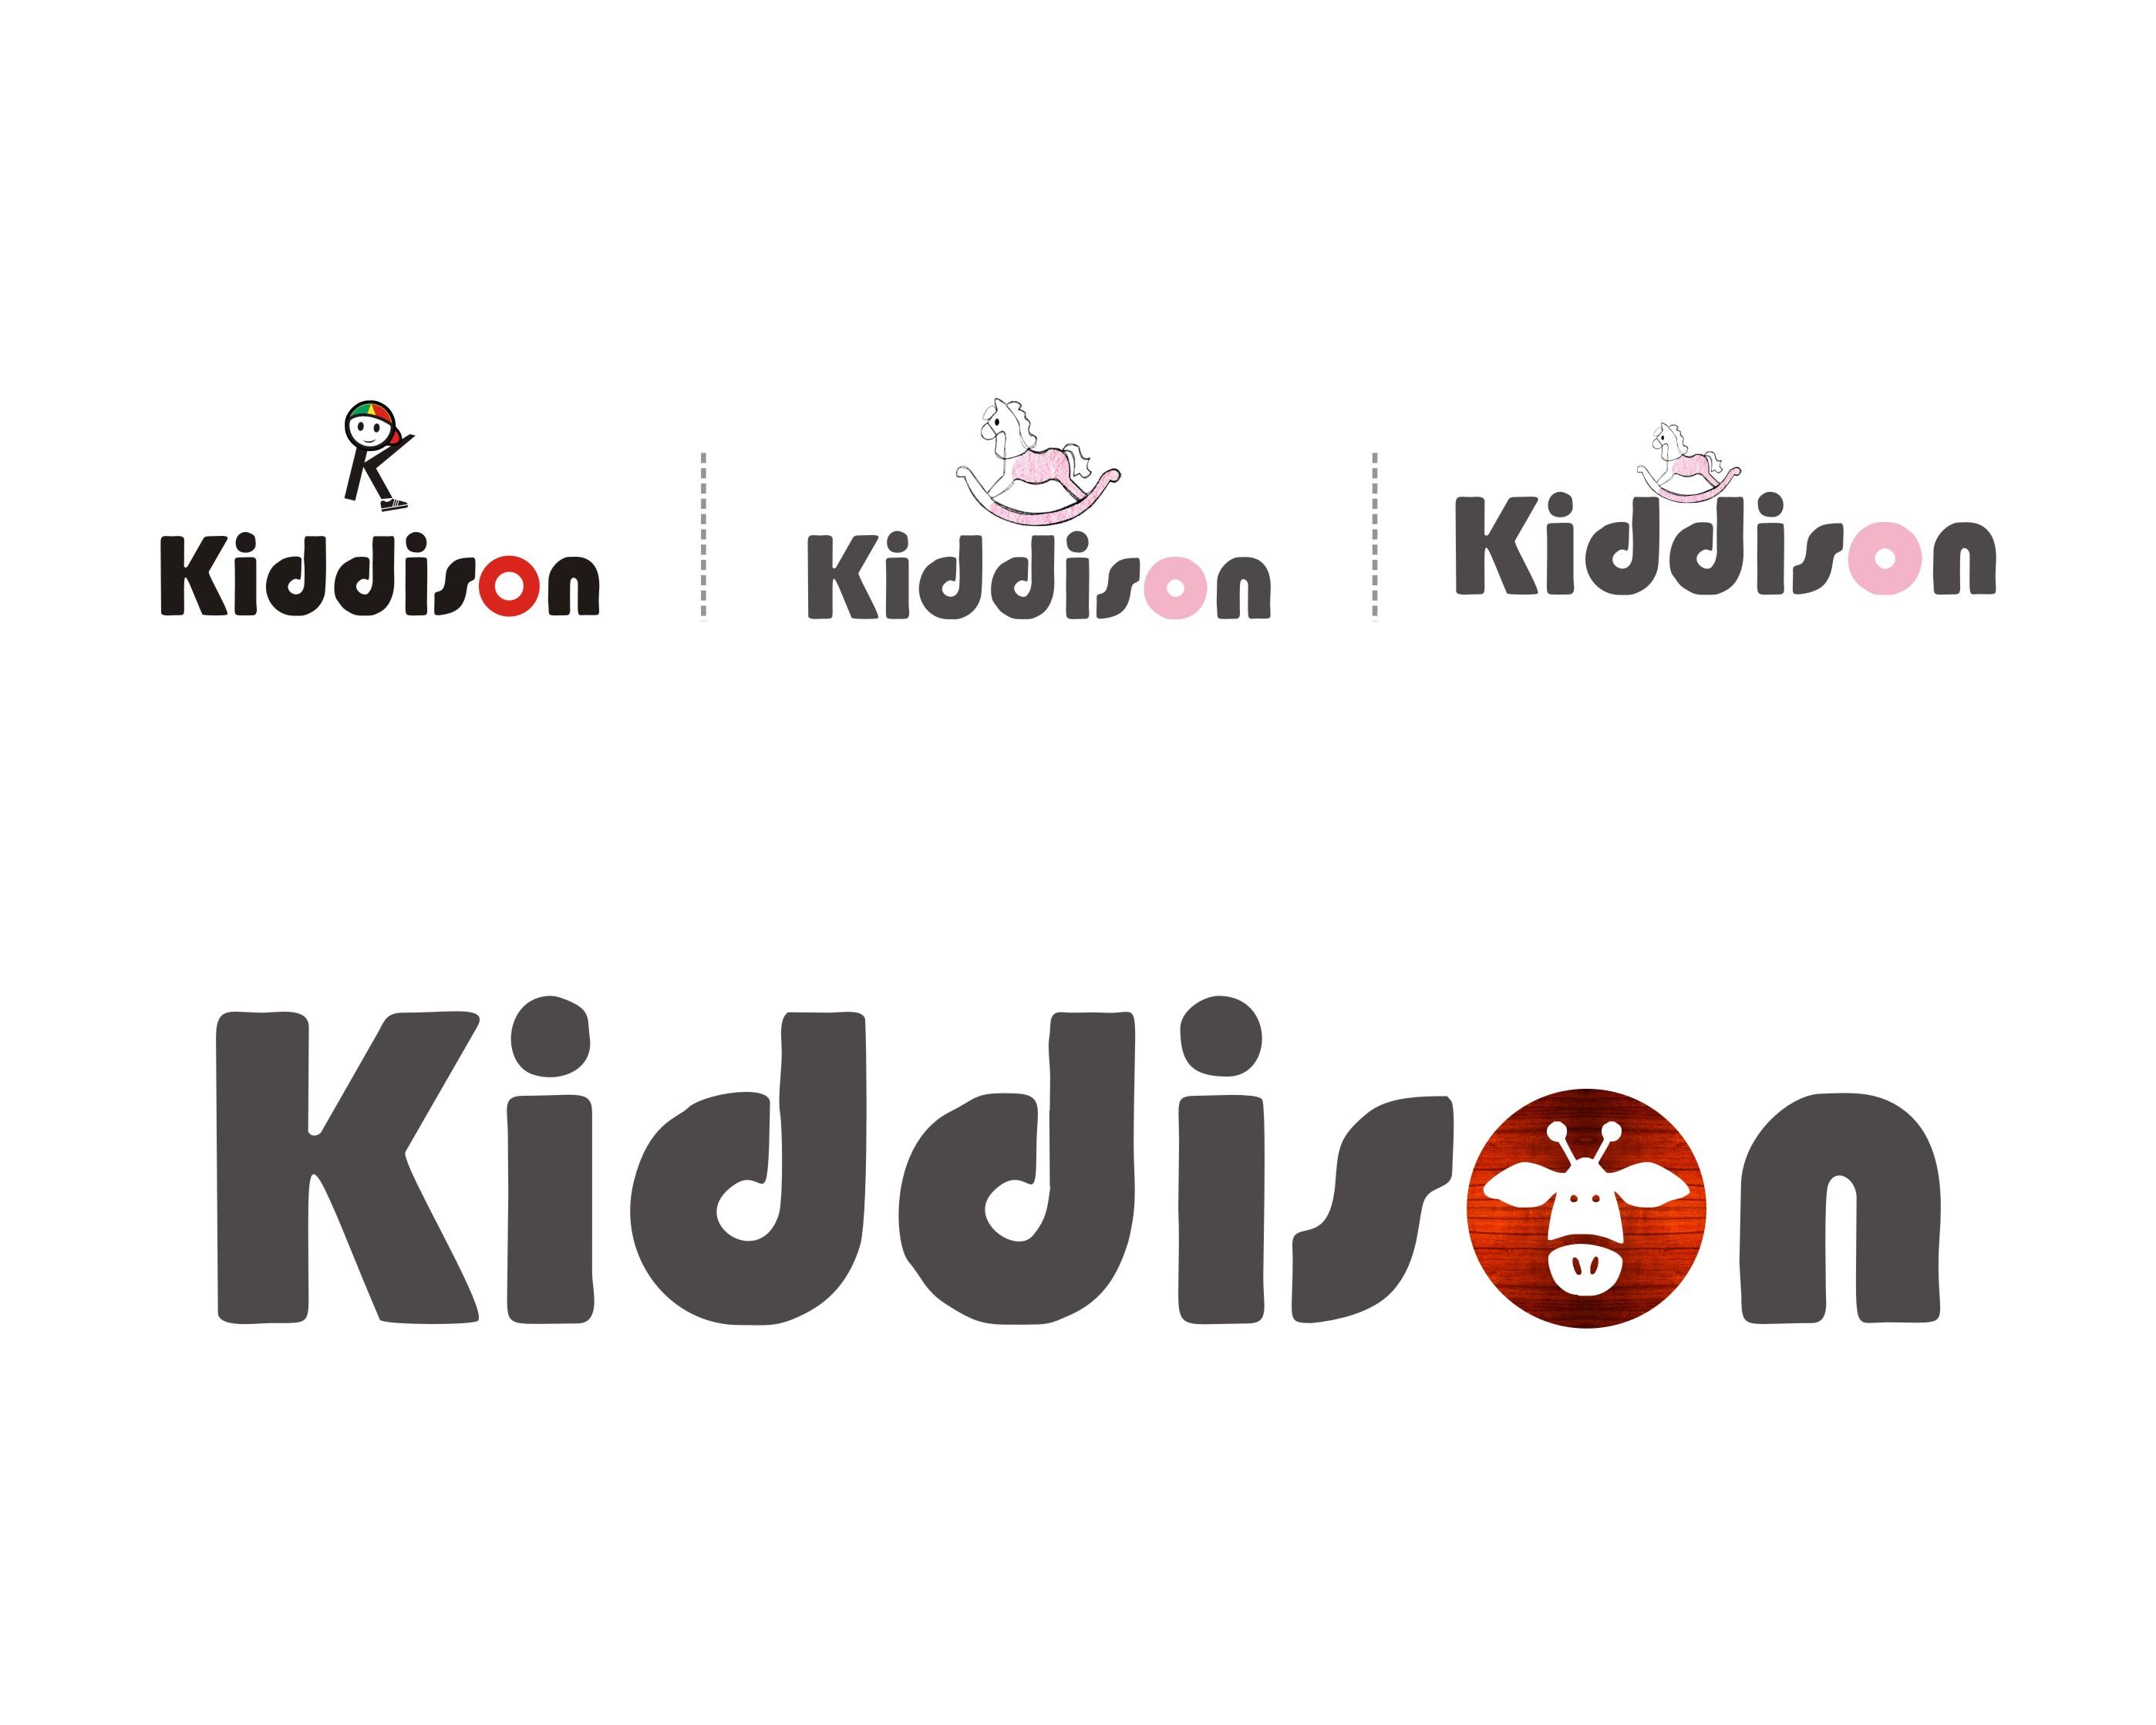 Kiddison Case Study